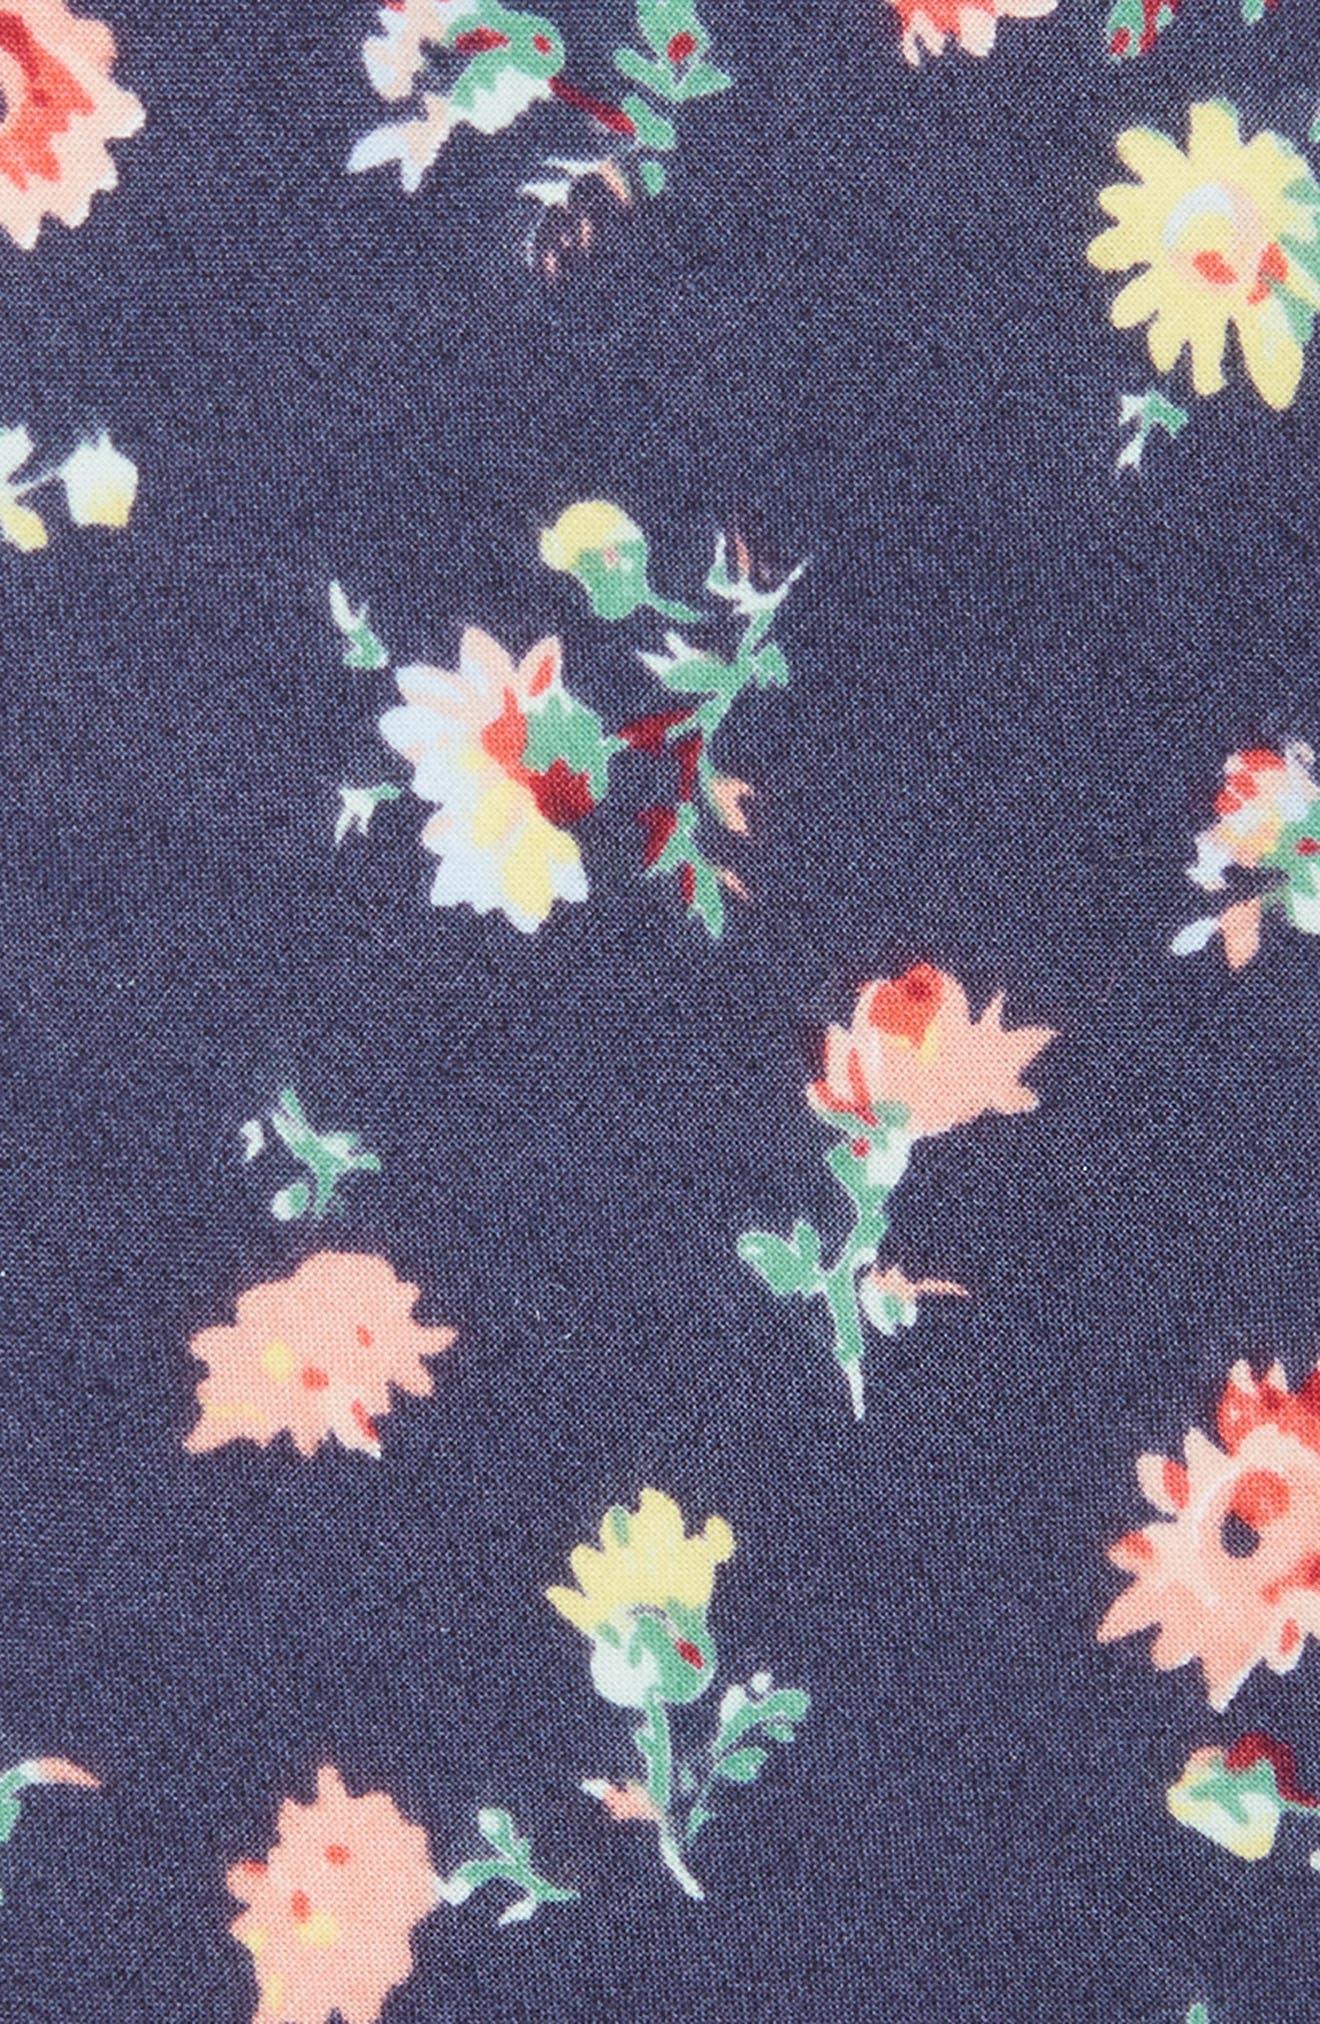 Floral Cotton Skinny Tie,                             Alternate thumbnail 2, color,                             410